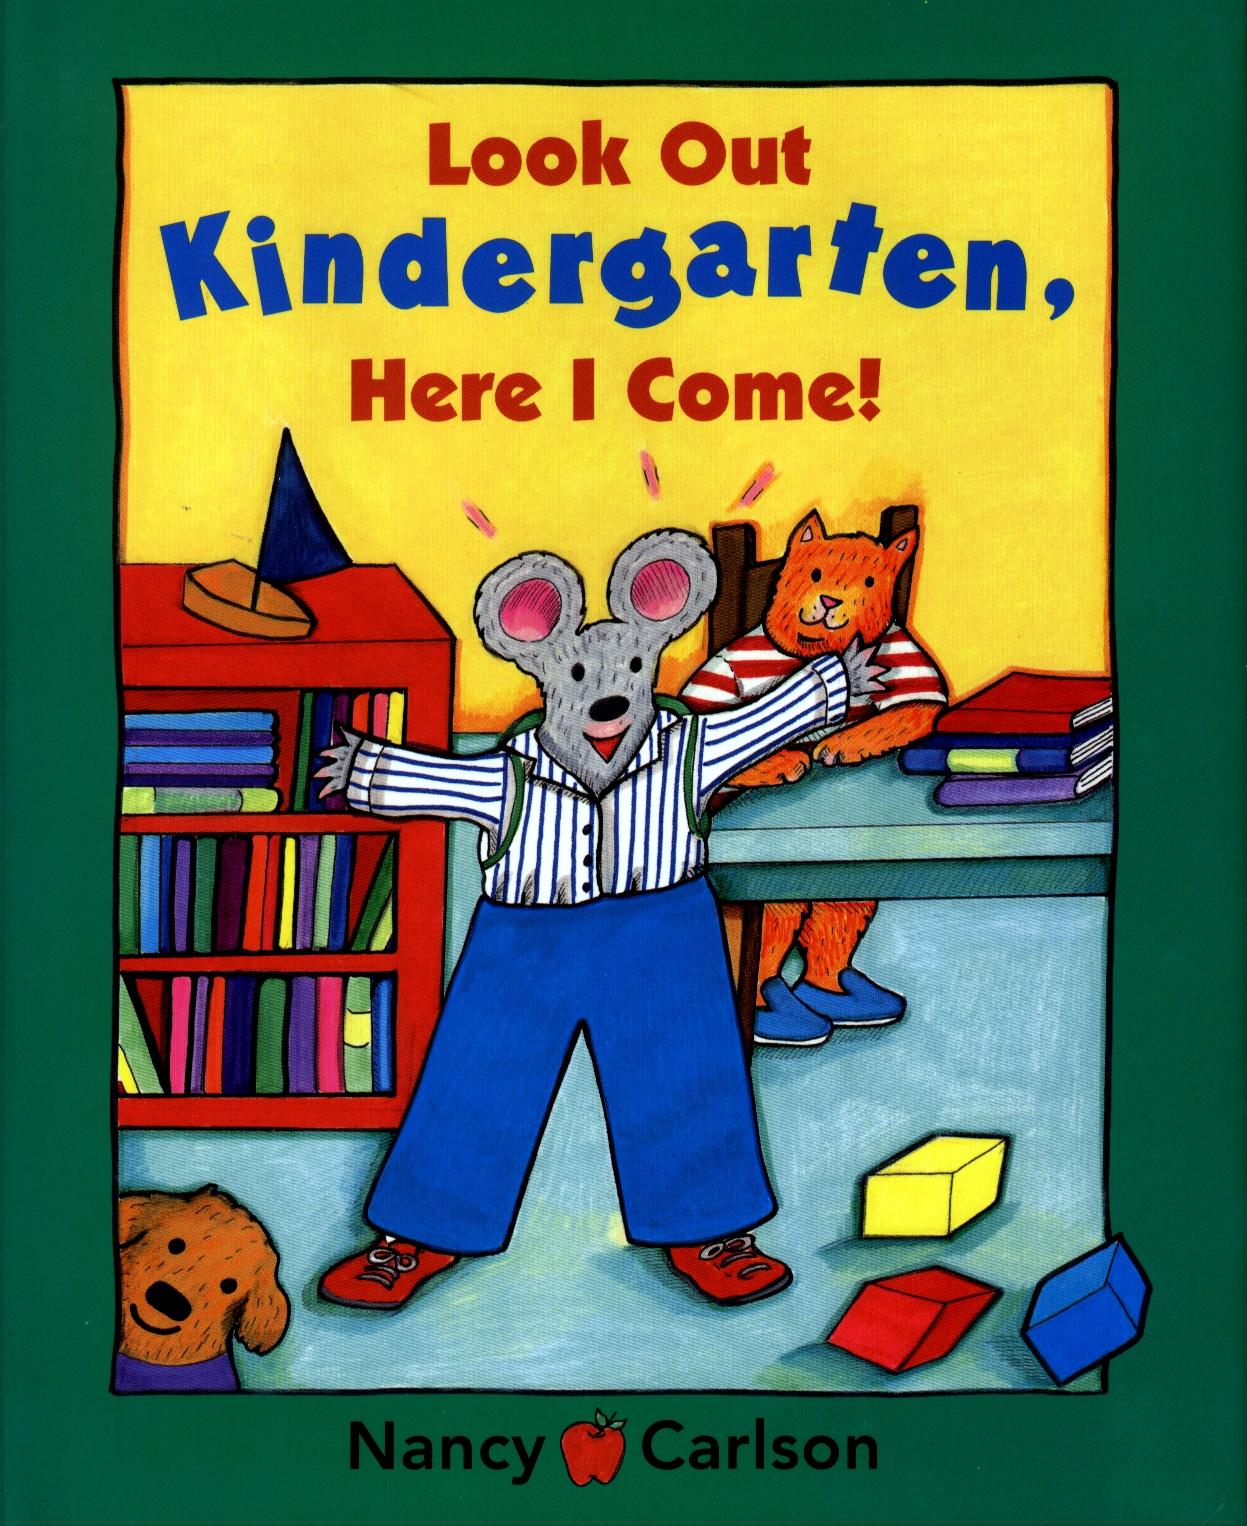 look out kindergarten here i come.JPG